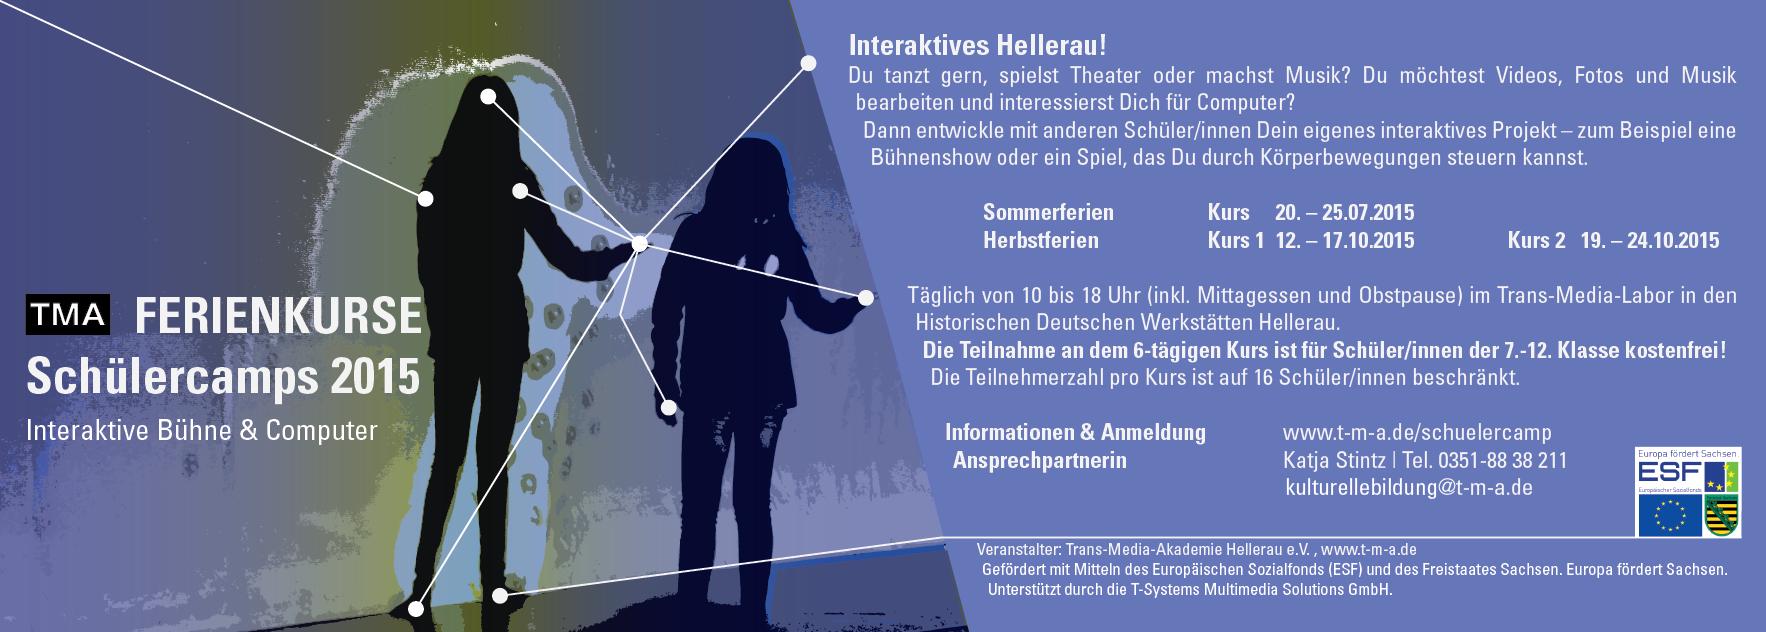 Flyer TMA Schülercamp 2015 Interaktive Bühne Dresden